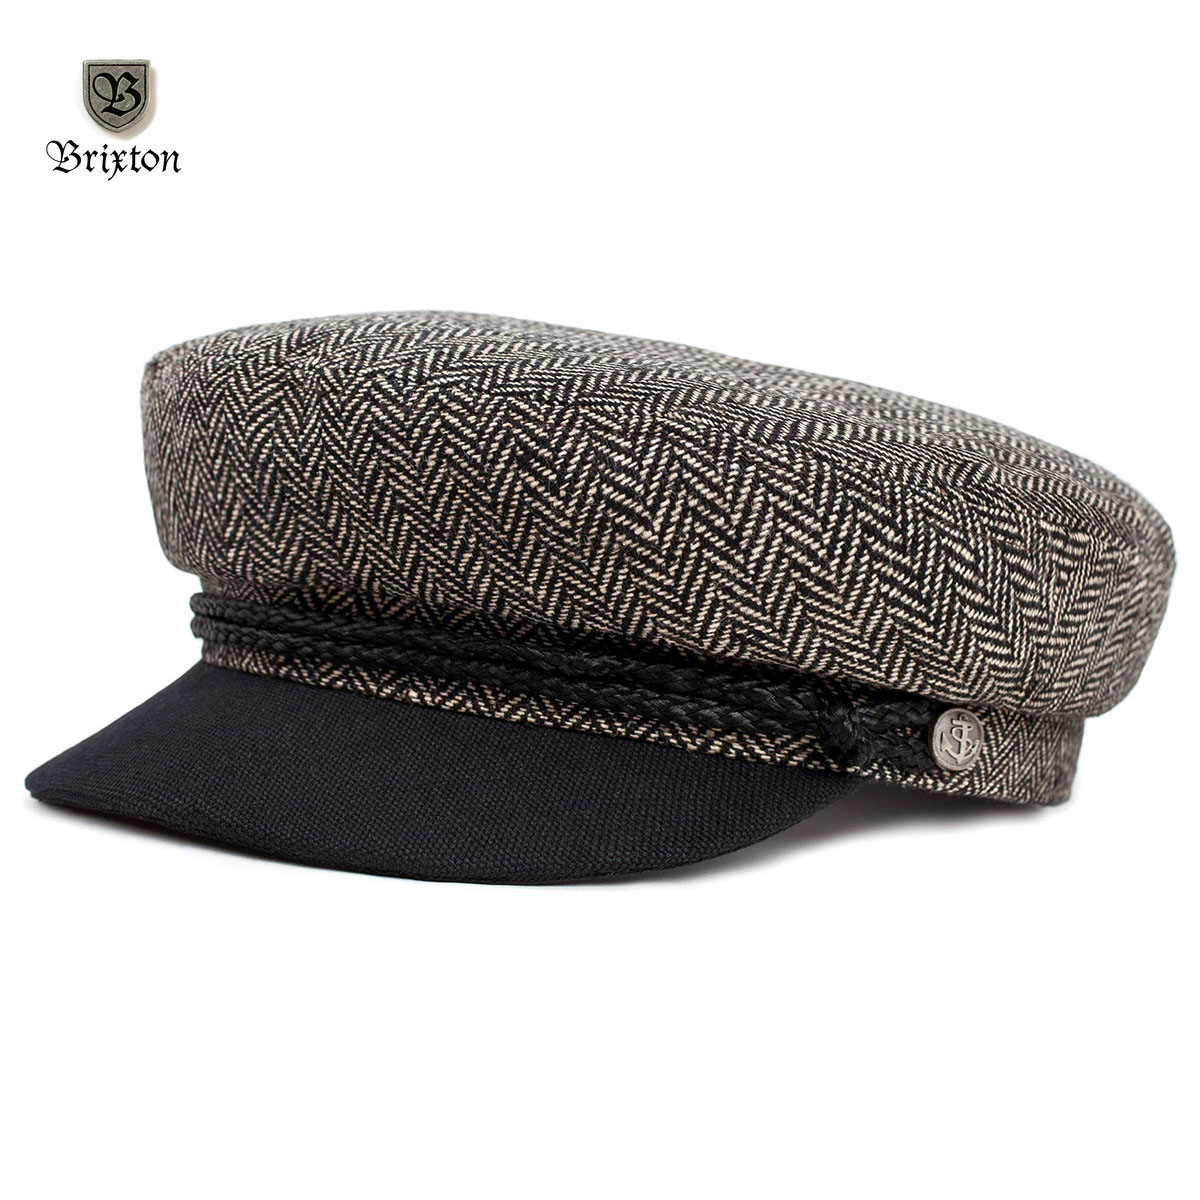 Fiddler Hat by Brixton- HEATHER GREY / BLACK